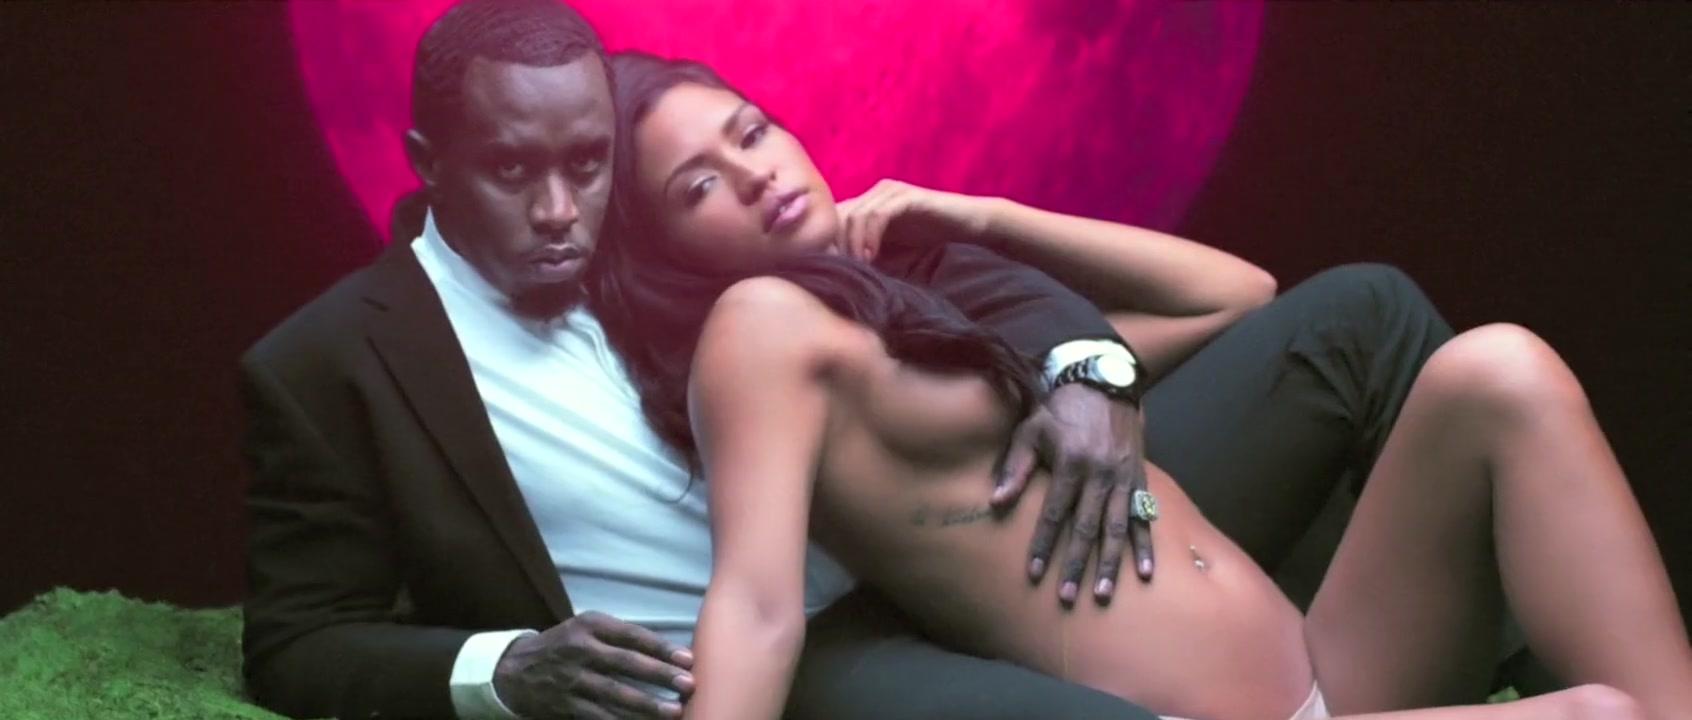 Cassie Ventura - 3AM (2015) kim kardashian sex tapea